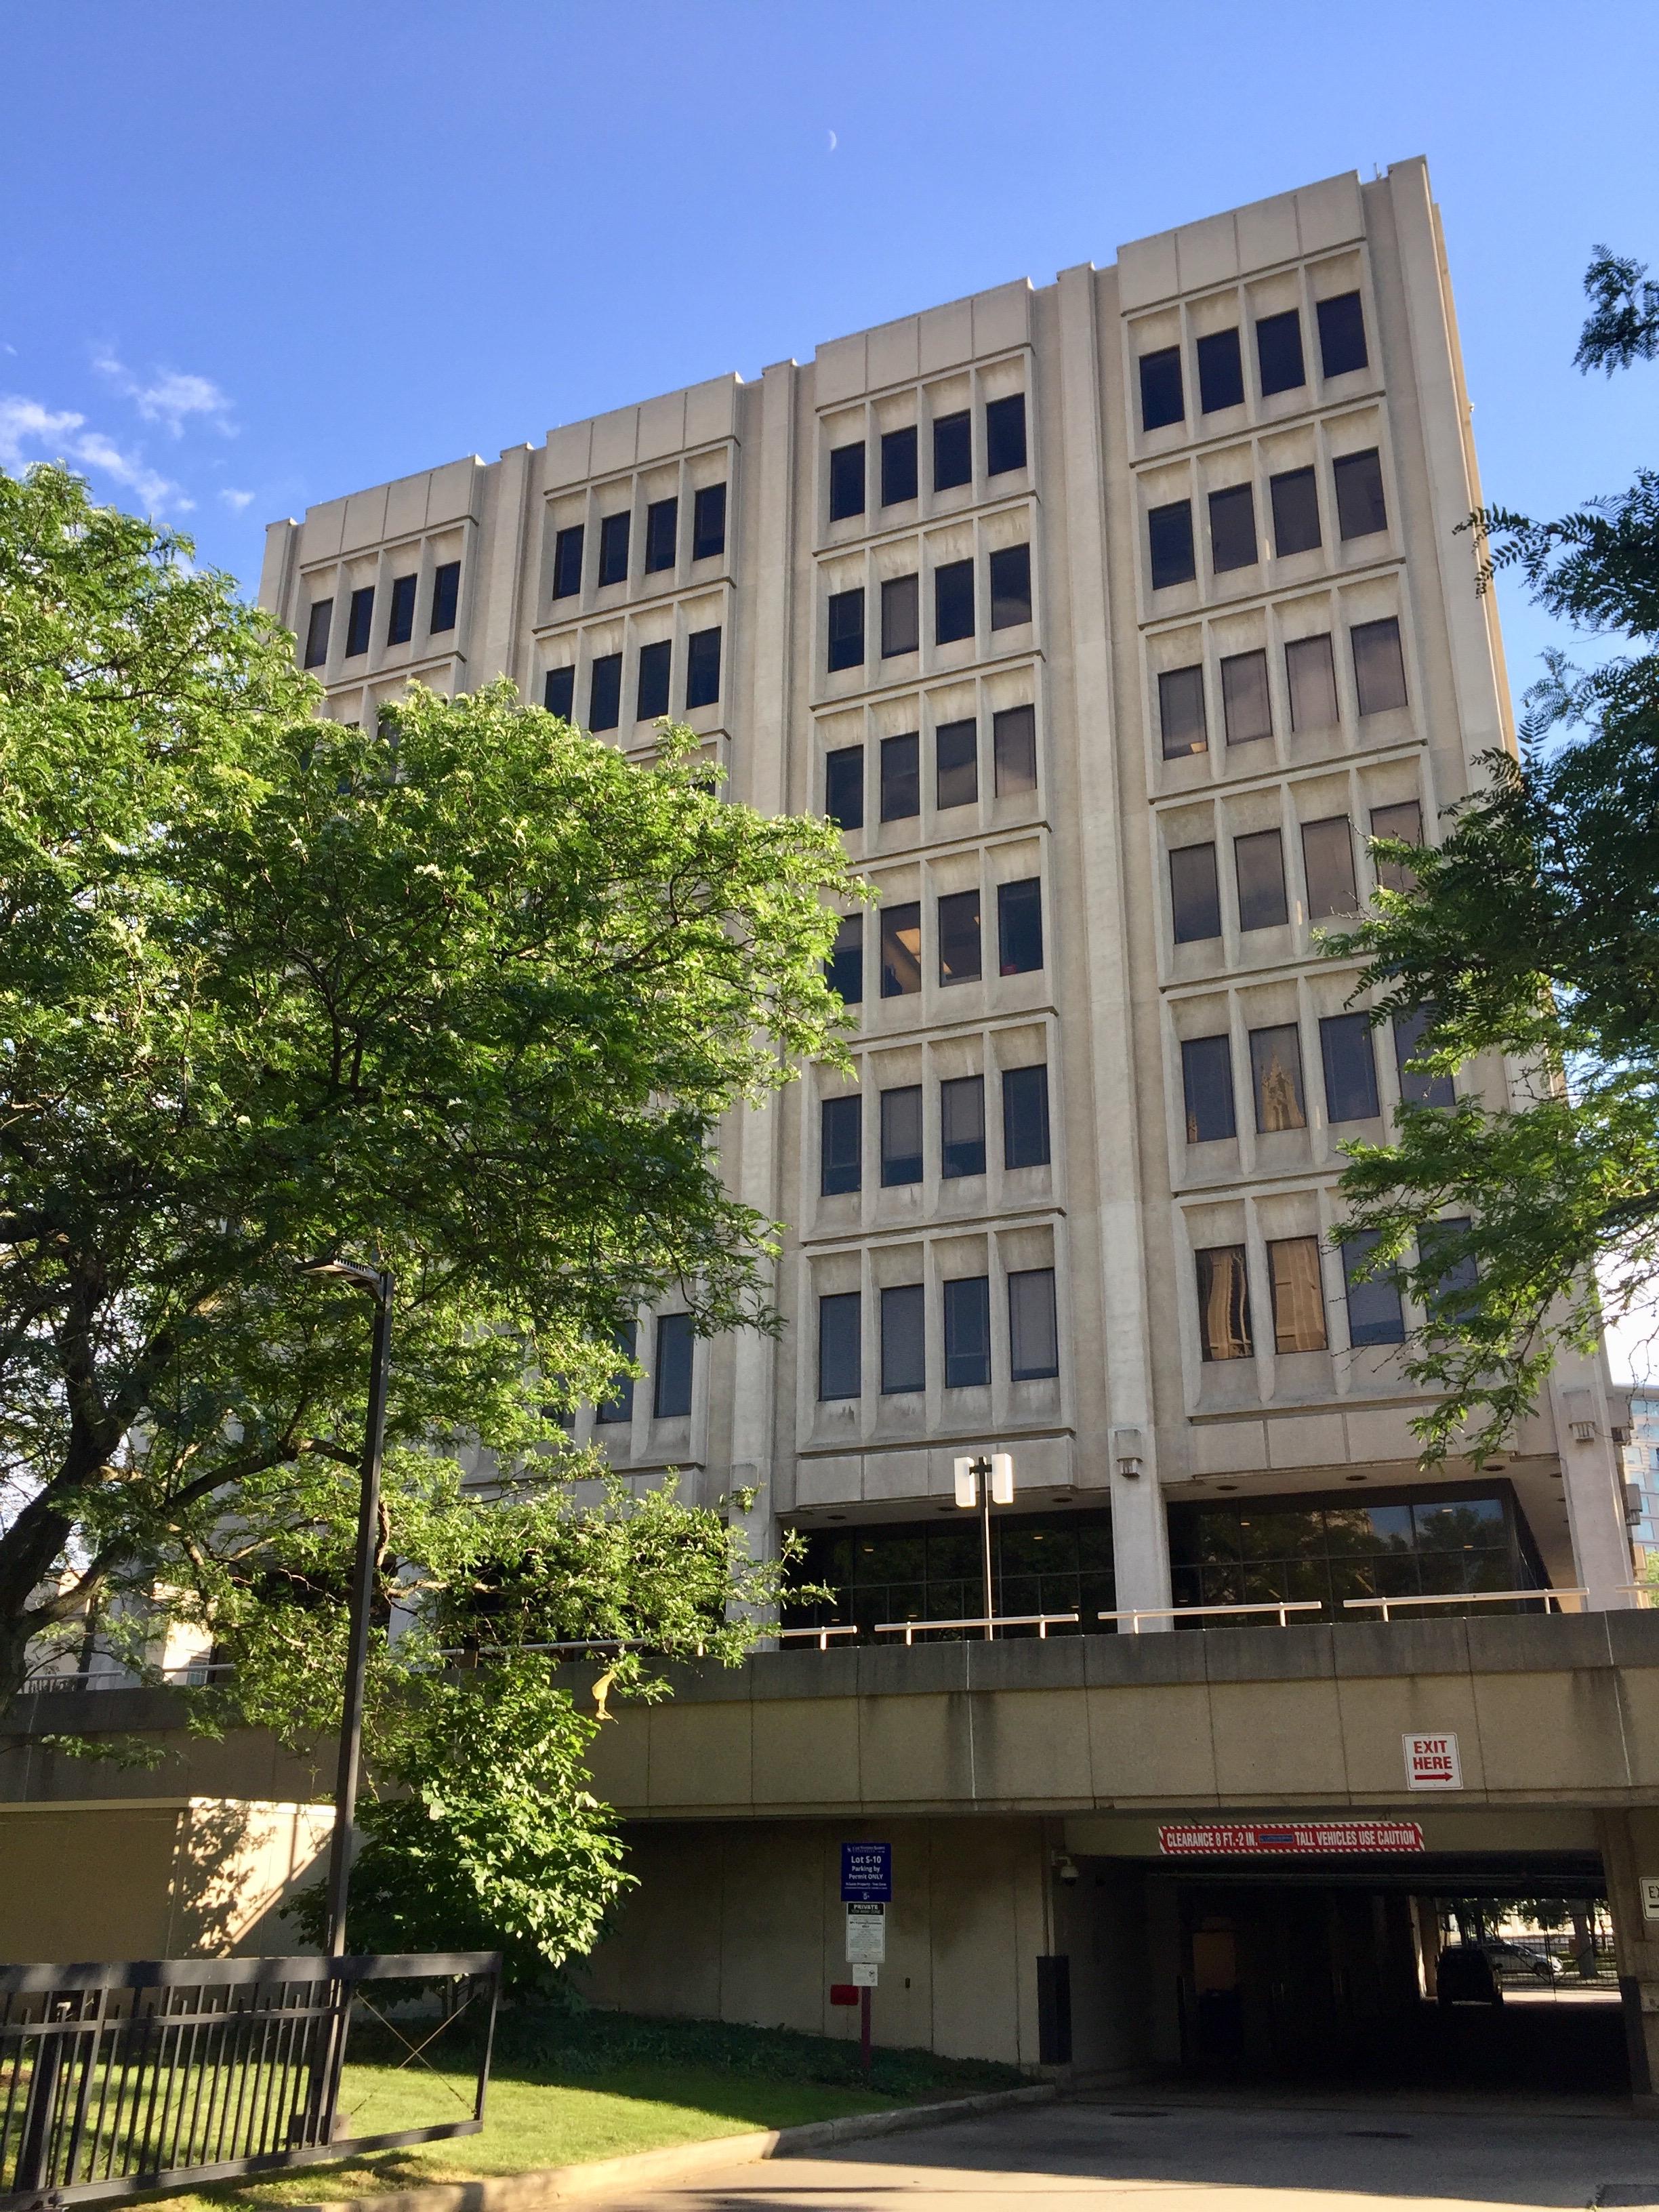 File:Crawford Hall, Case Western Reserve University